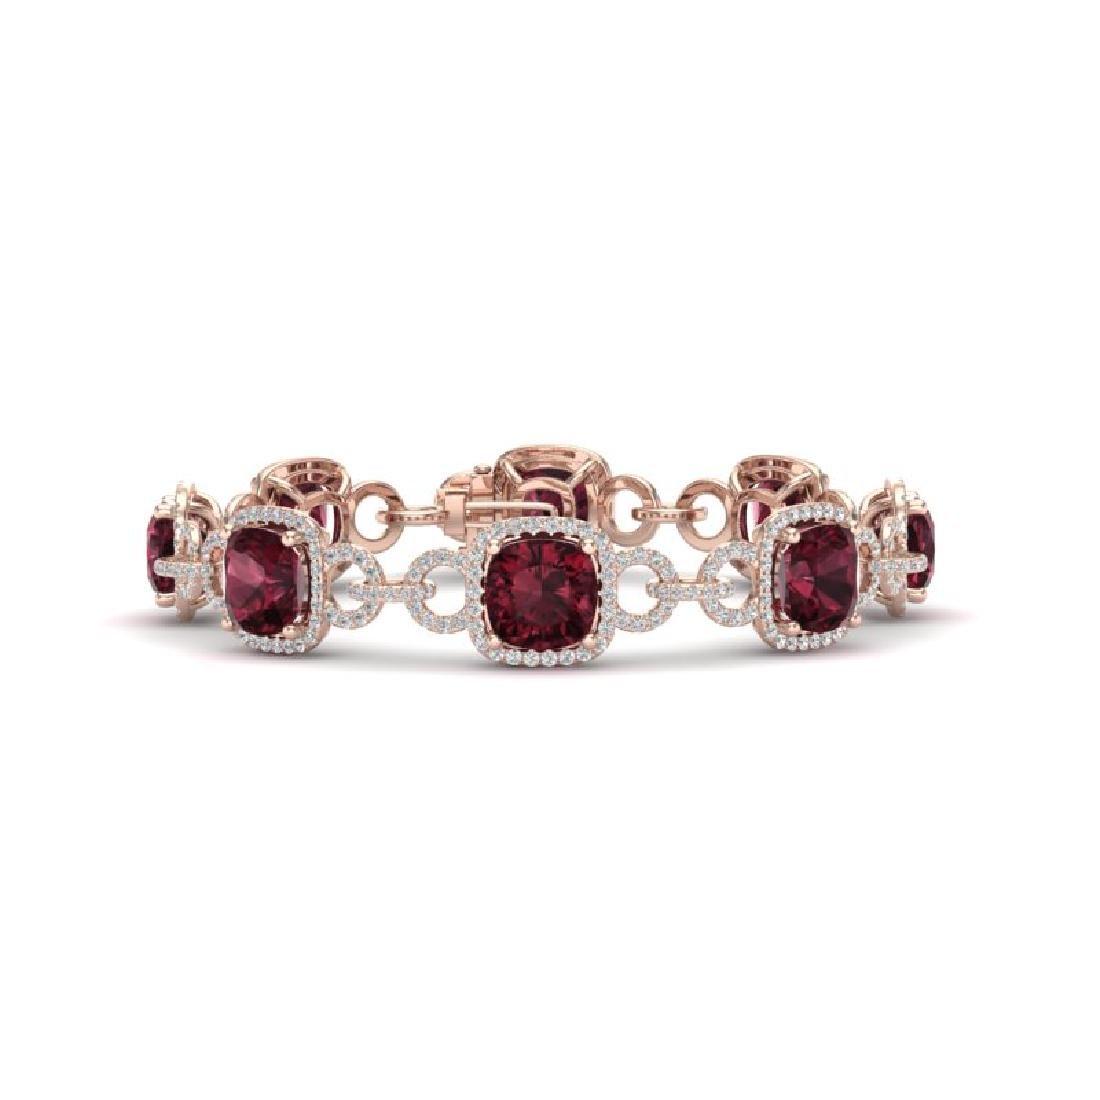 30 CTW Garnet & VS/SI Diamond Bracelet 14K Rose Gold